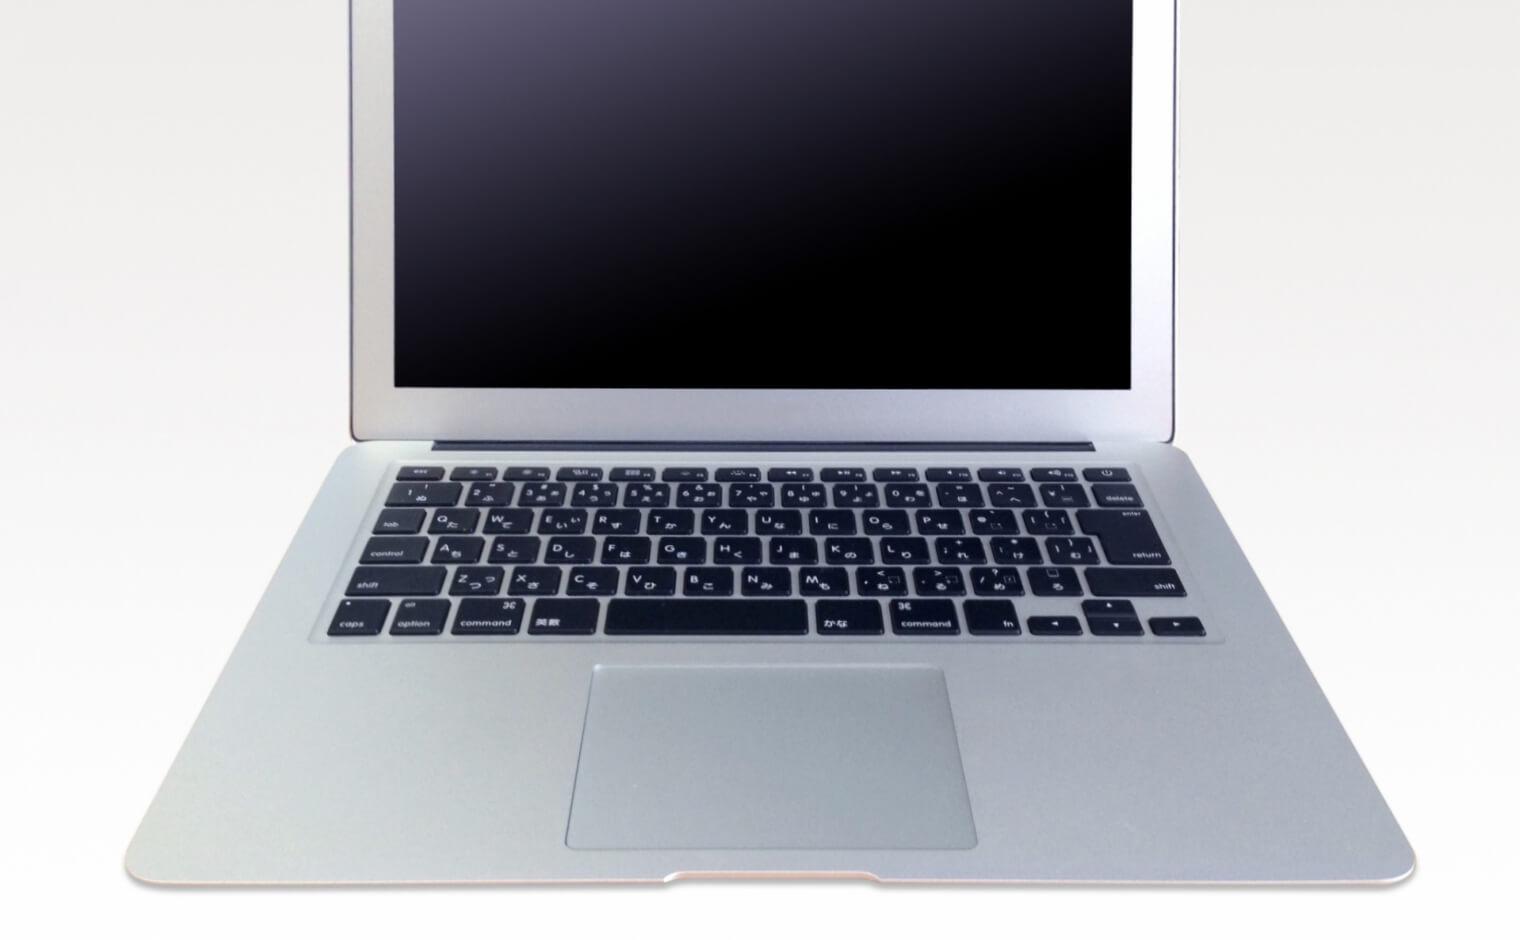 MacBook Airの脚のがたつき